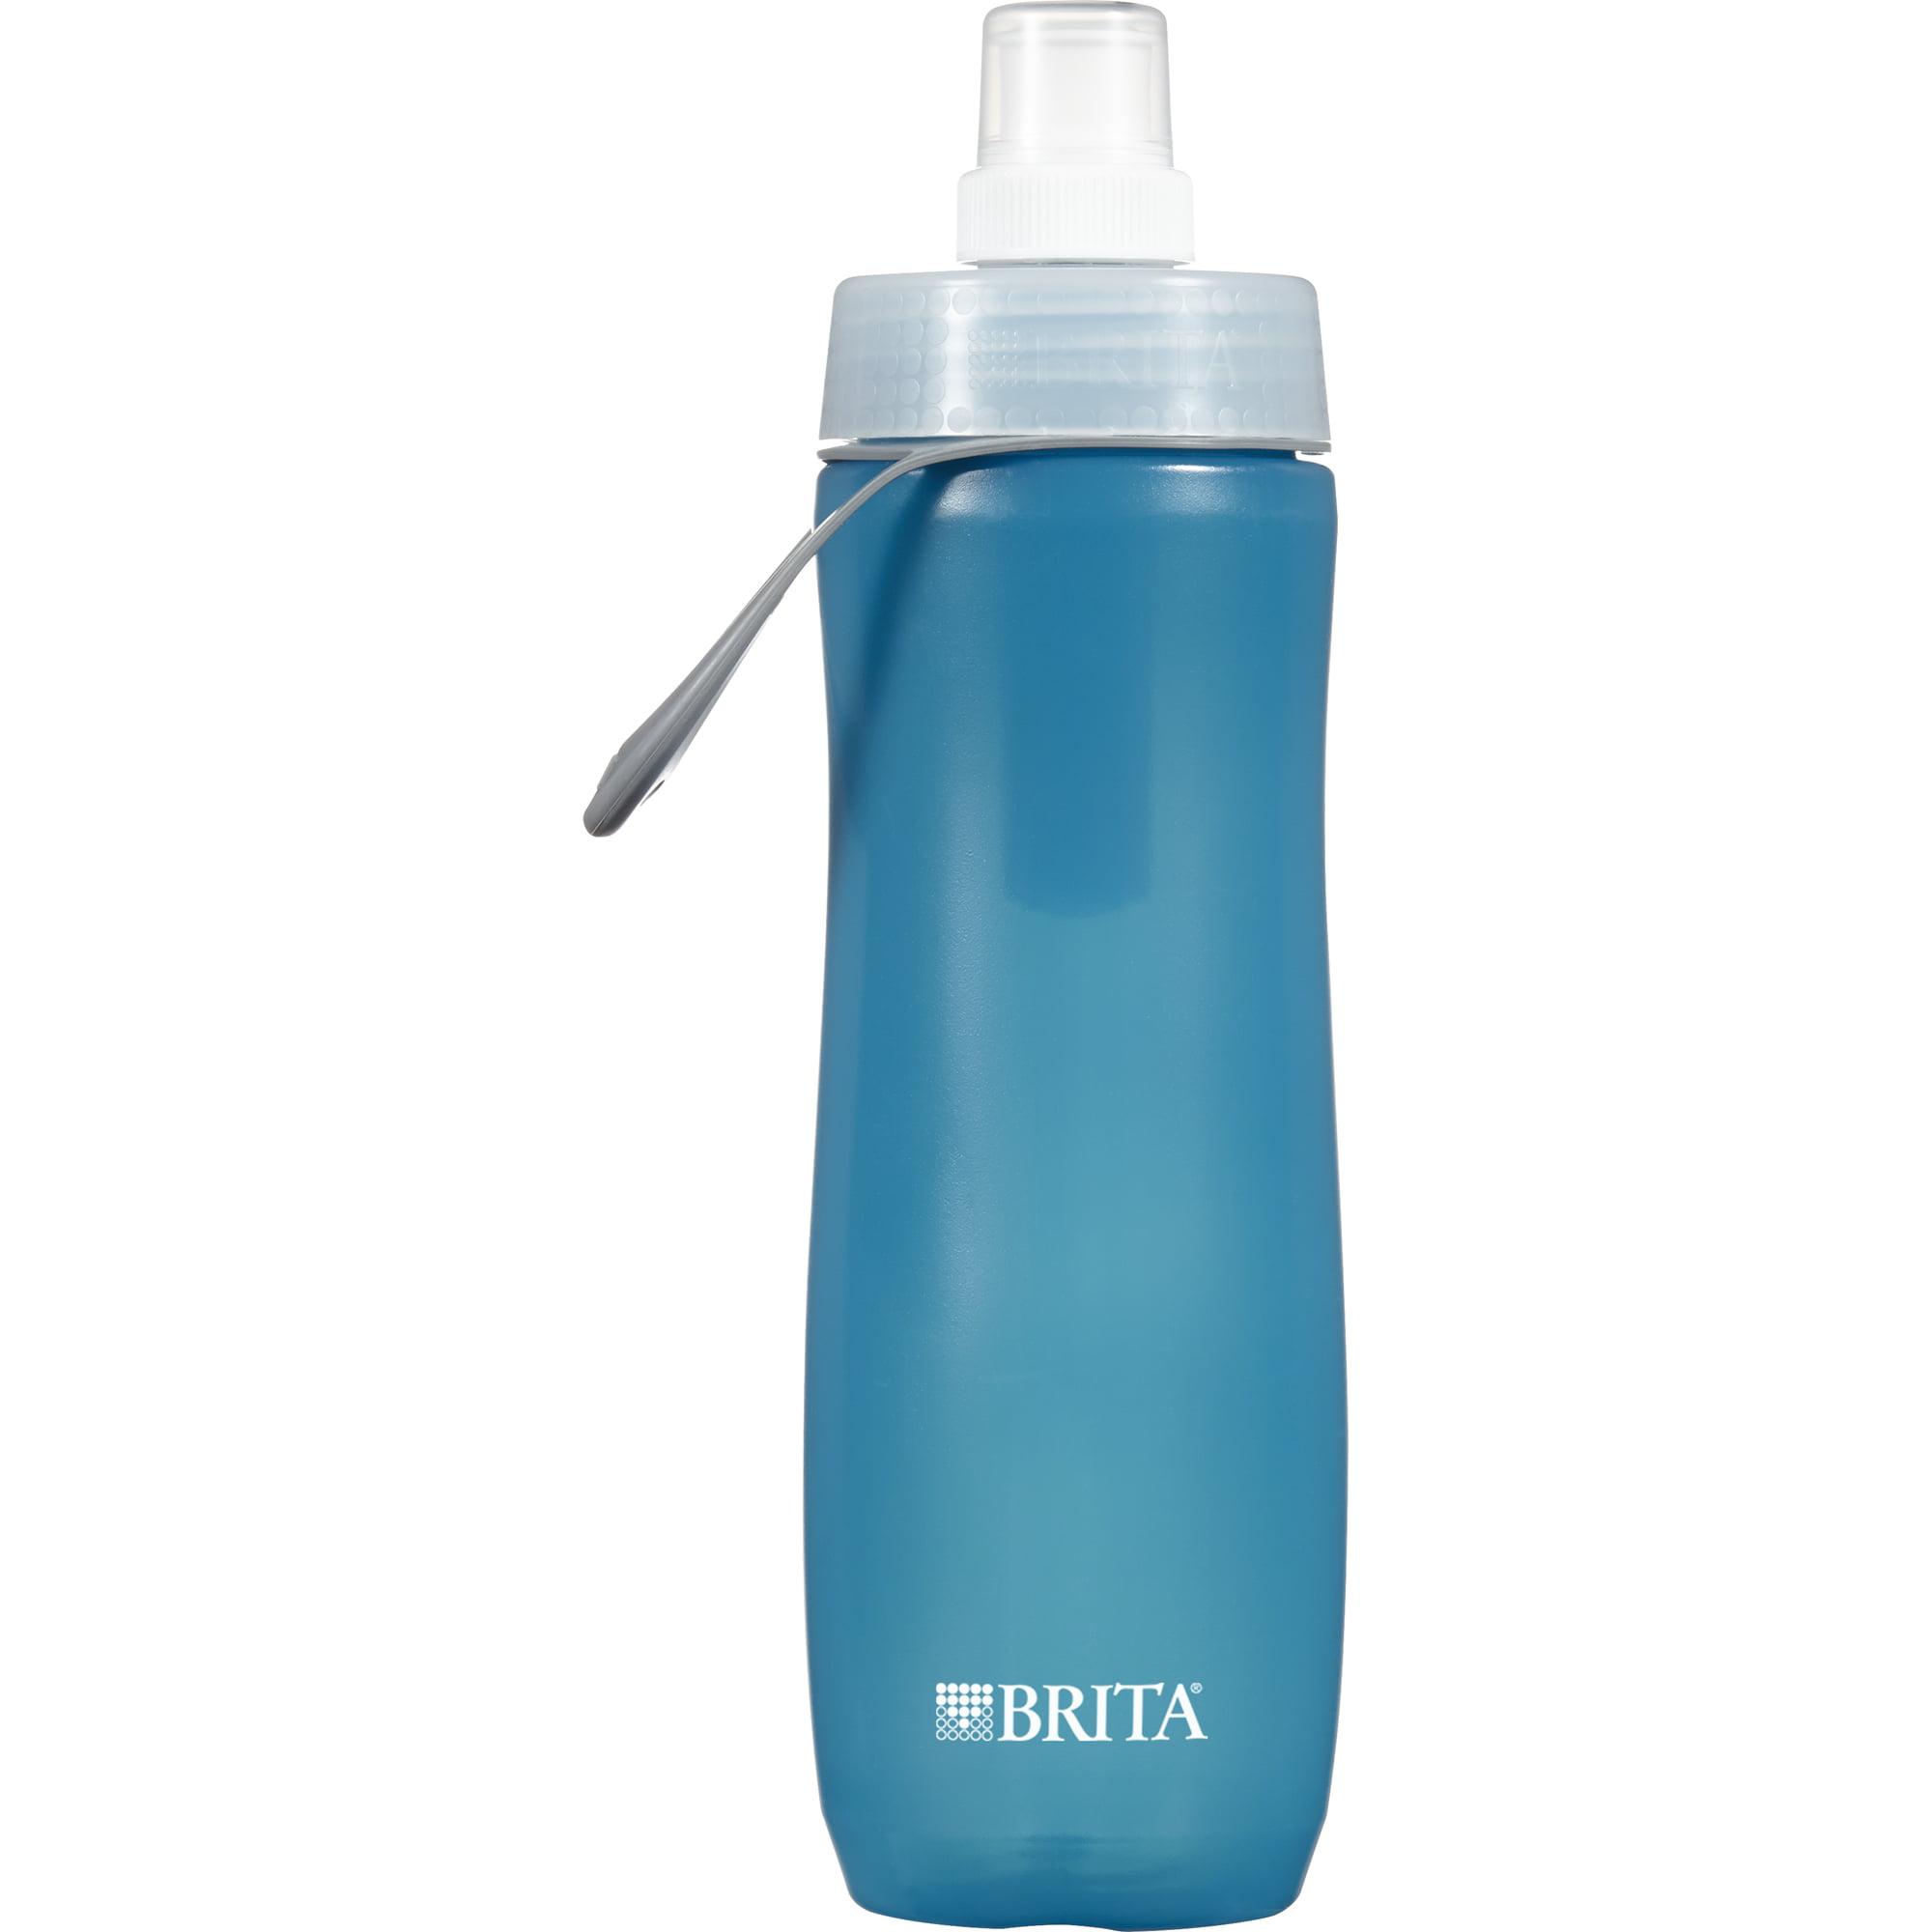 Brita Sport Water Bottle with Filter - BPA Free - Blue - 20 oz